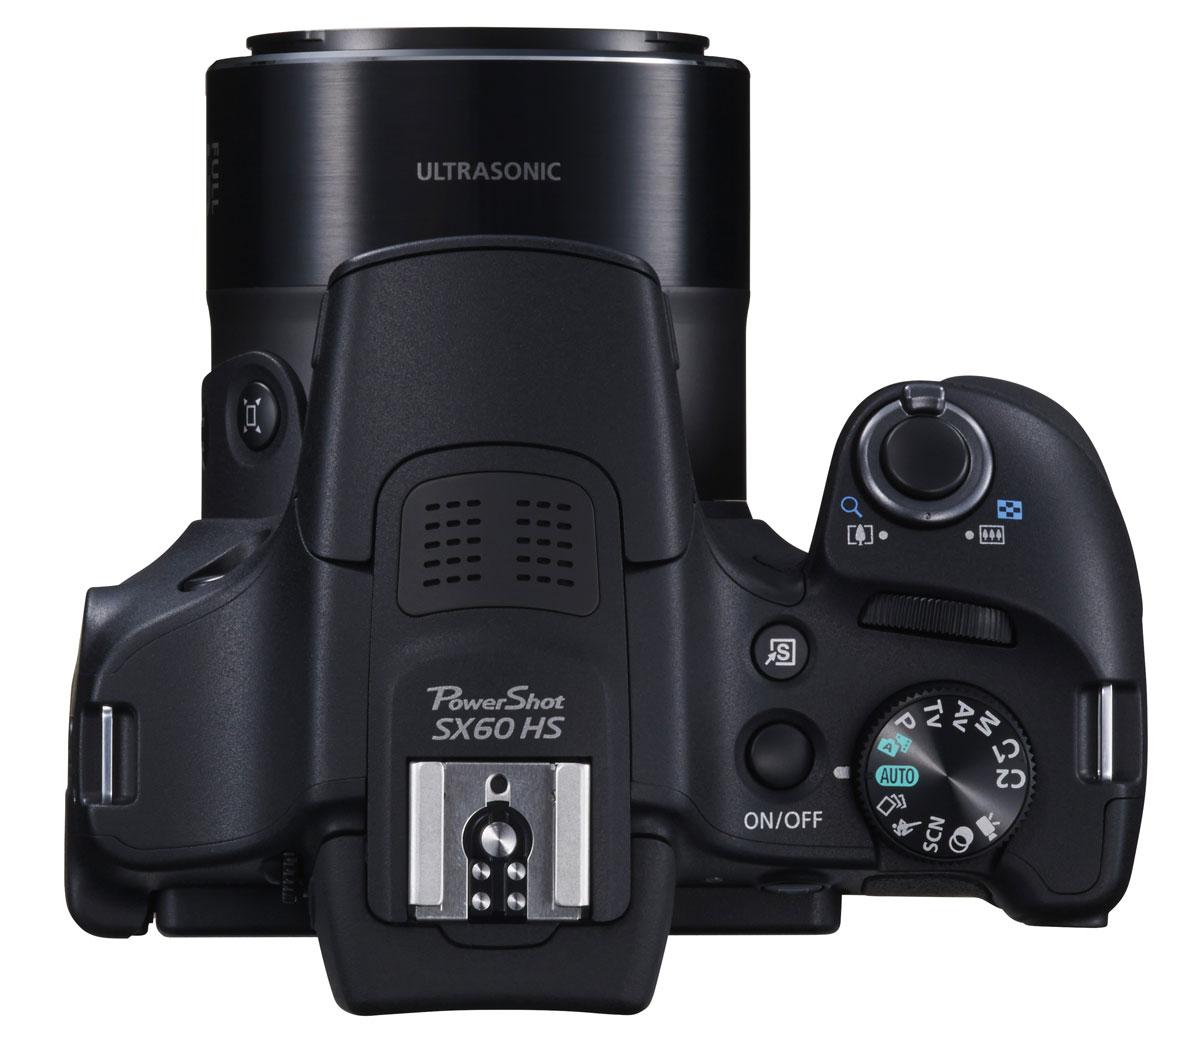 Canon PowerShot SX60 HSцифровая фотокамера Canon